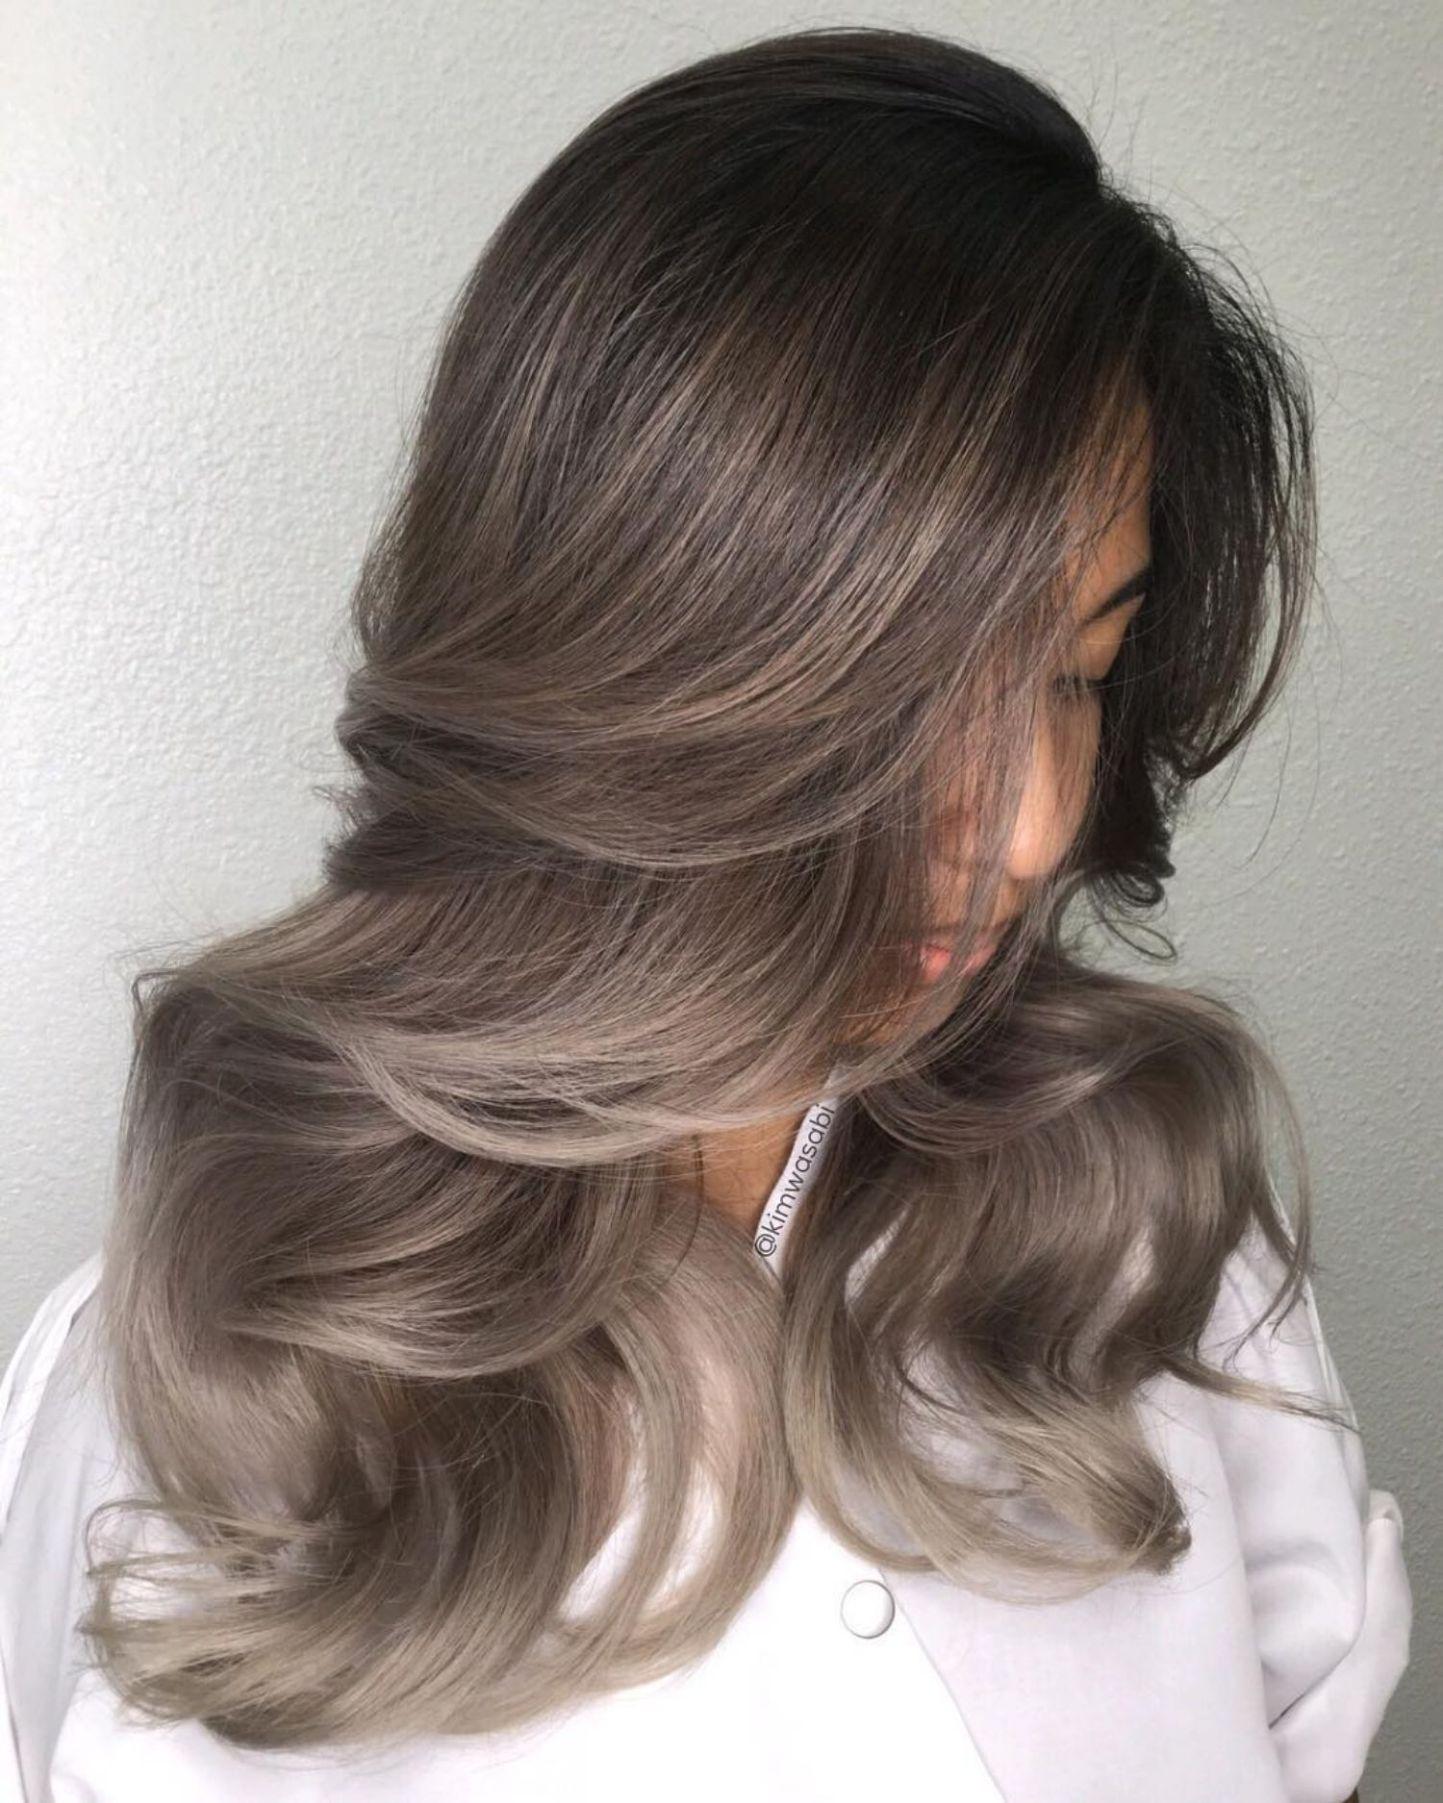 Sophisticated Ash Brown And Gray Balayage Hair Color For Brown Skin Gray Balayage Hair Color For Morena